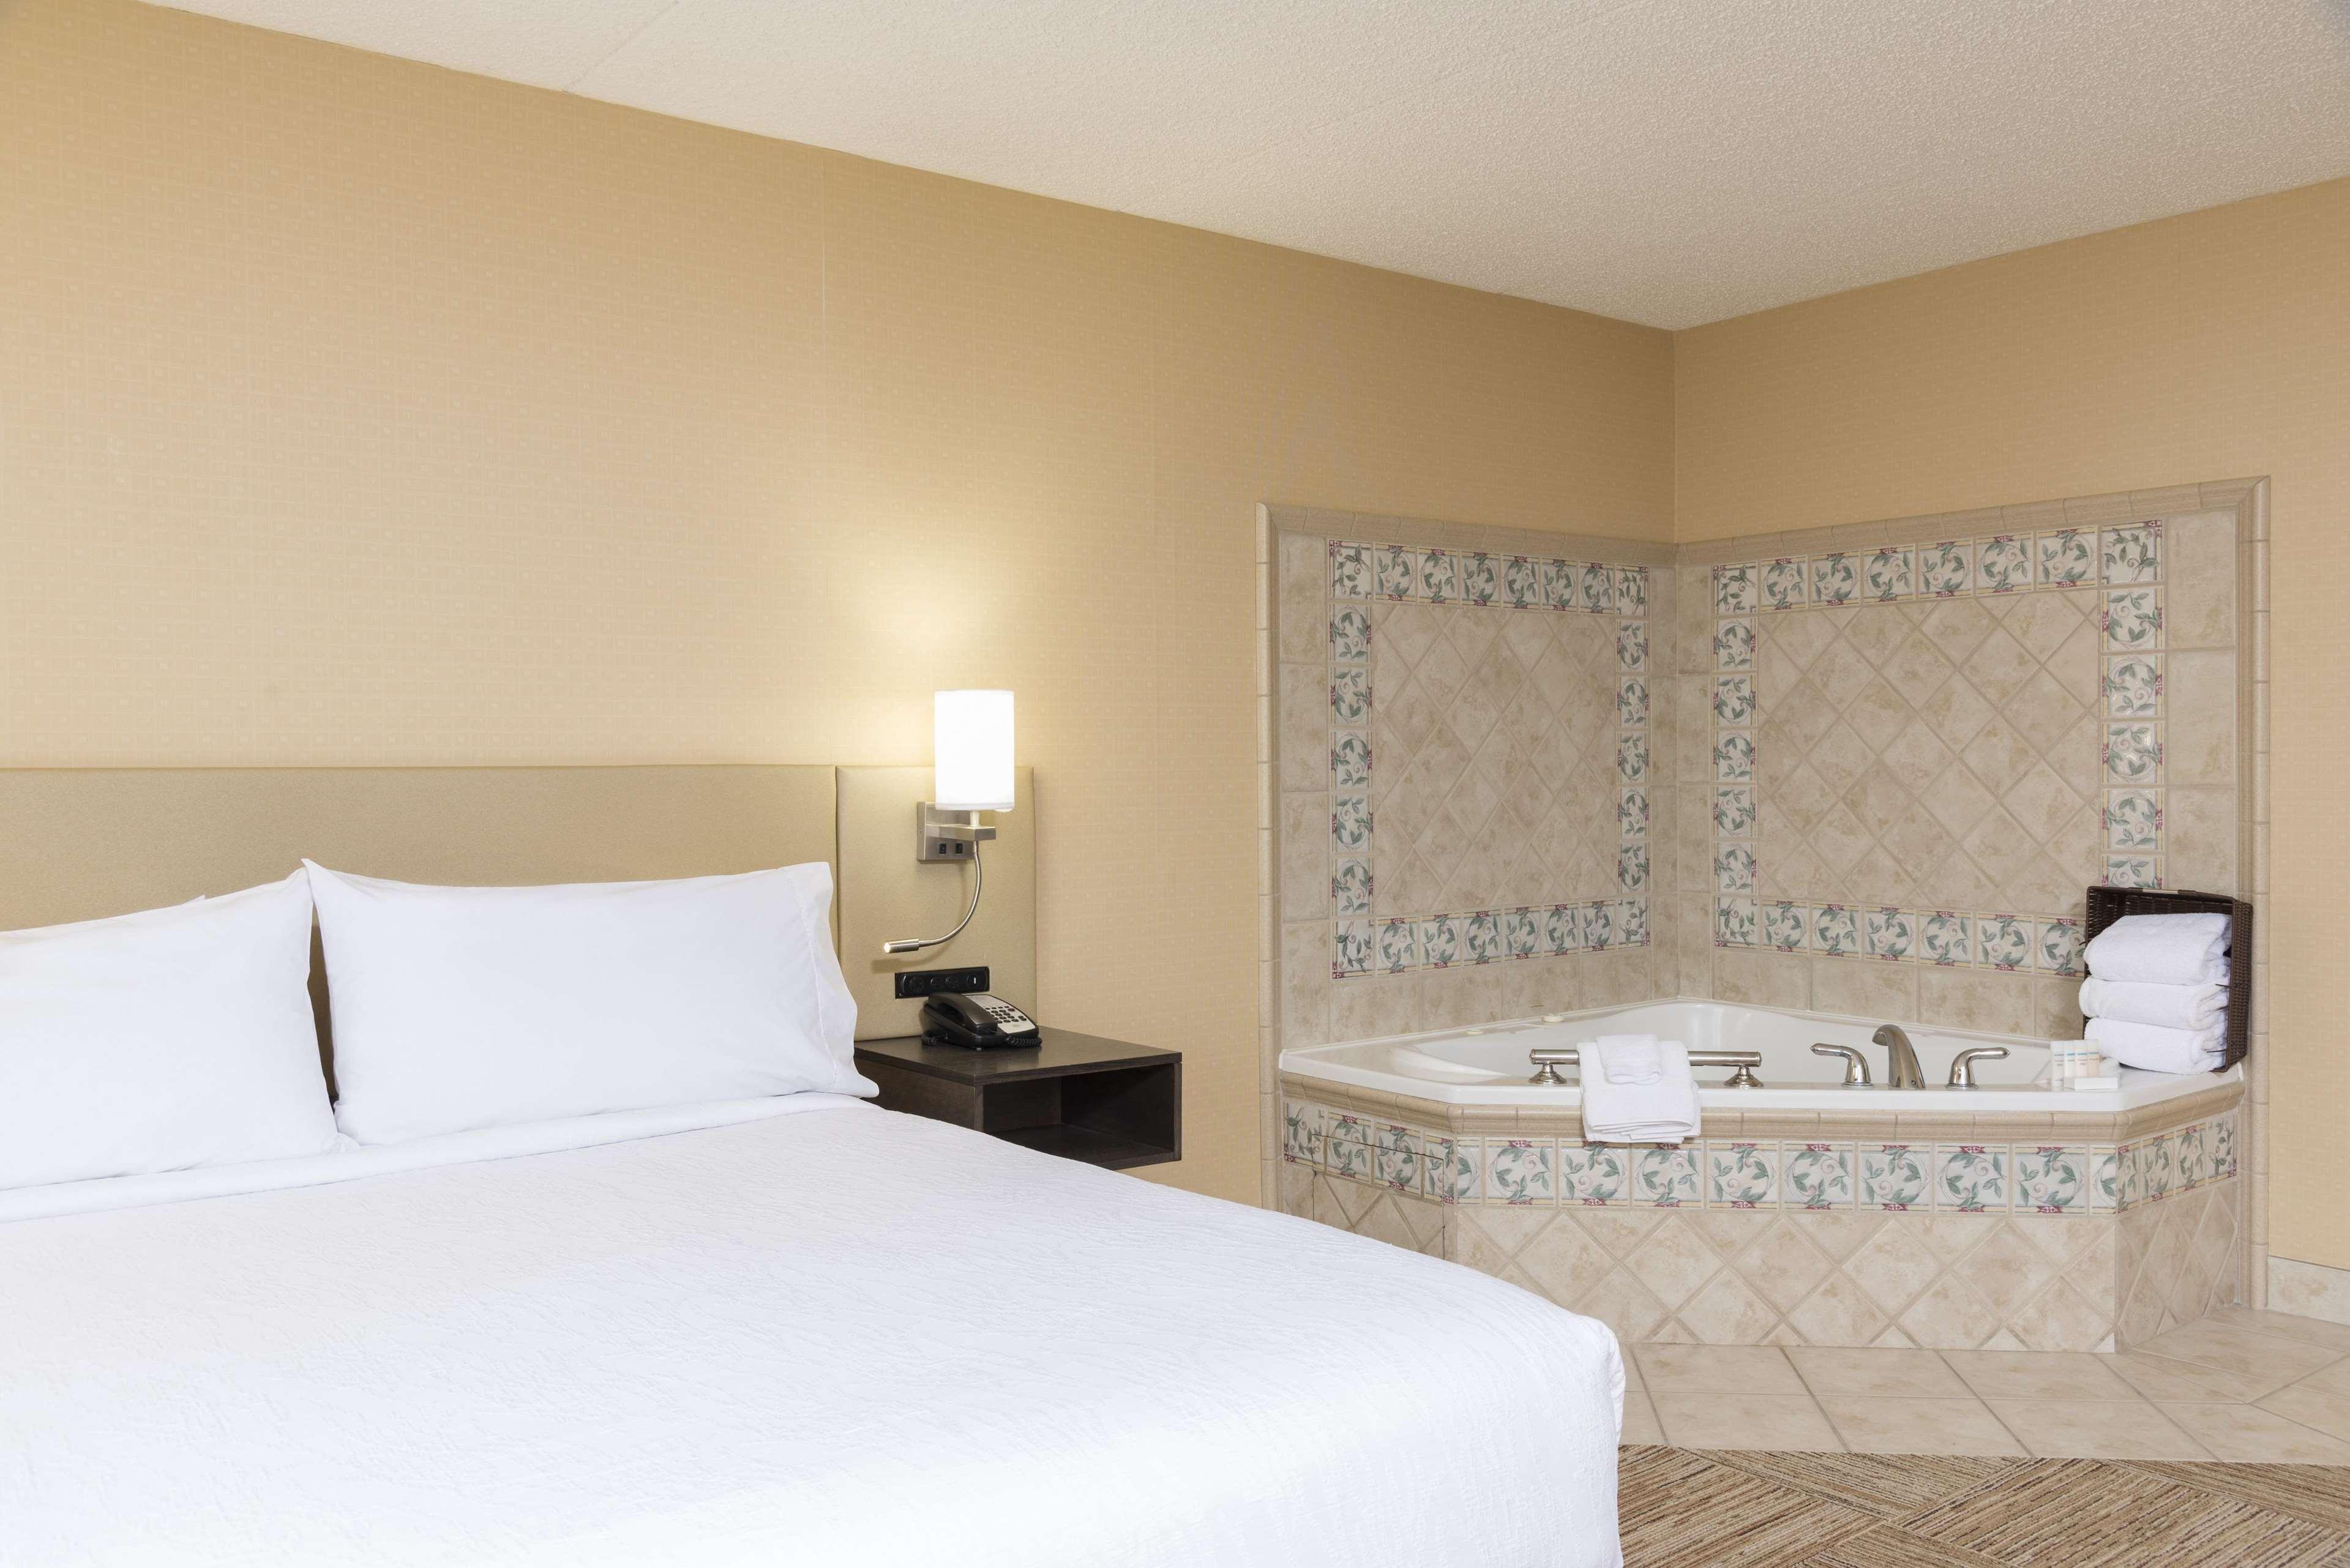 Hilton Garden Inn West Lafayette Wabash Landing image 45